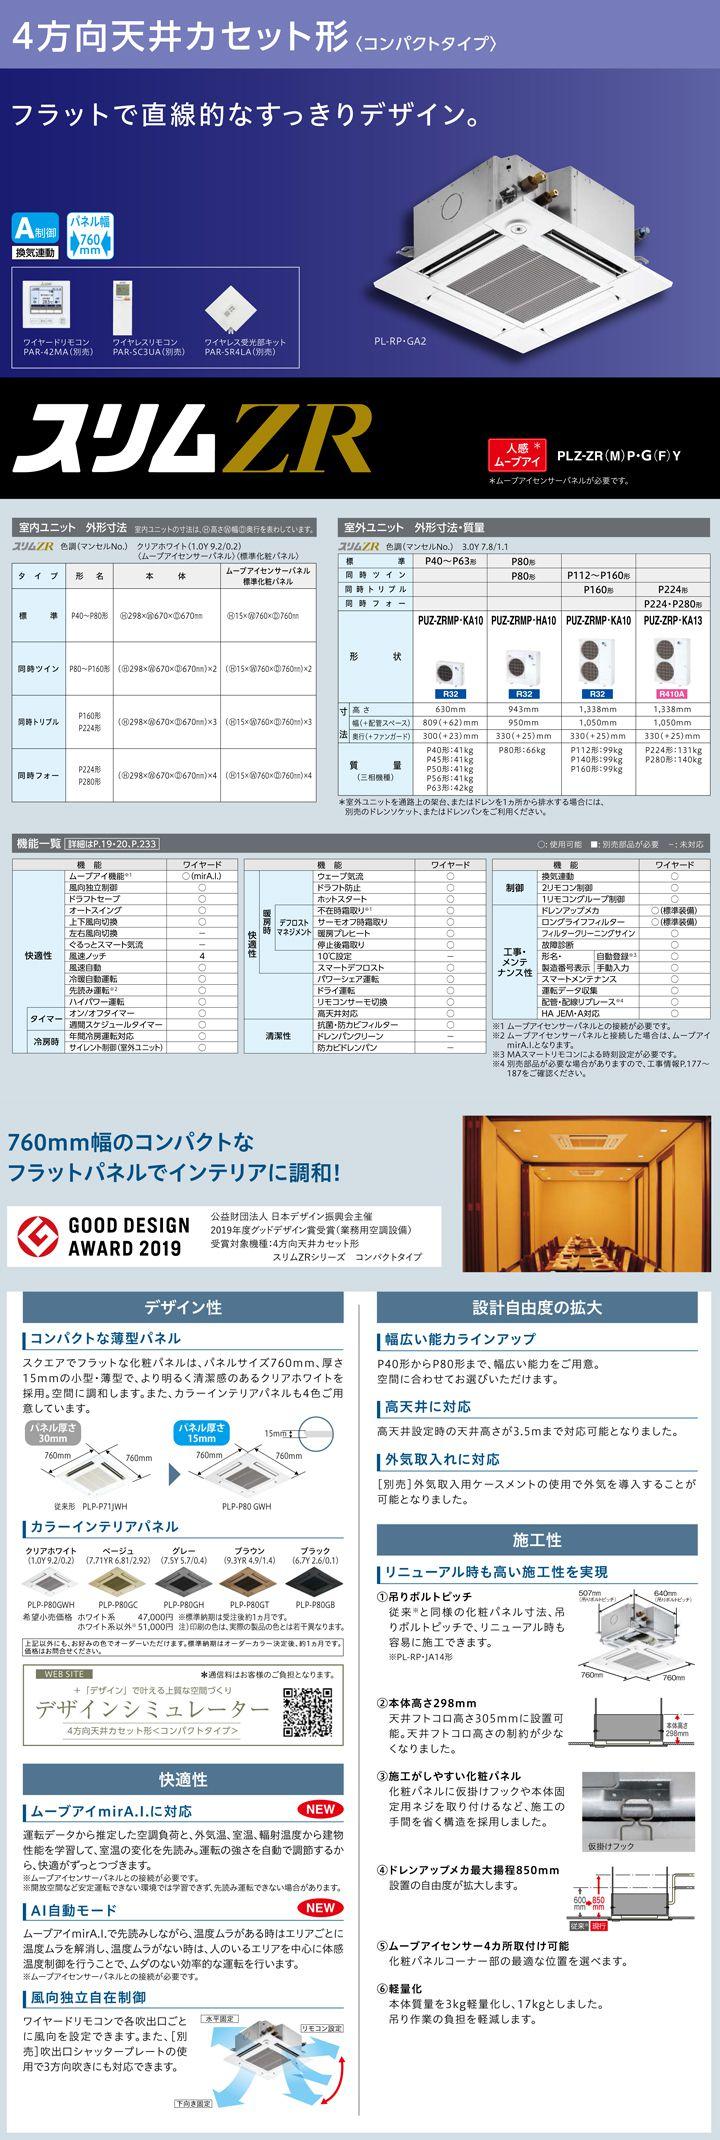 PLZ-ZRMP63GYカタログ